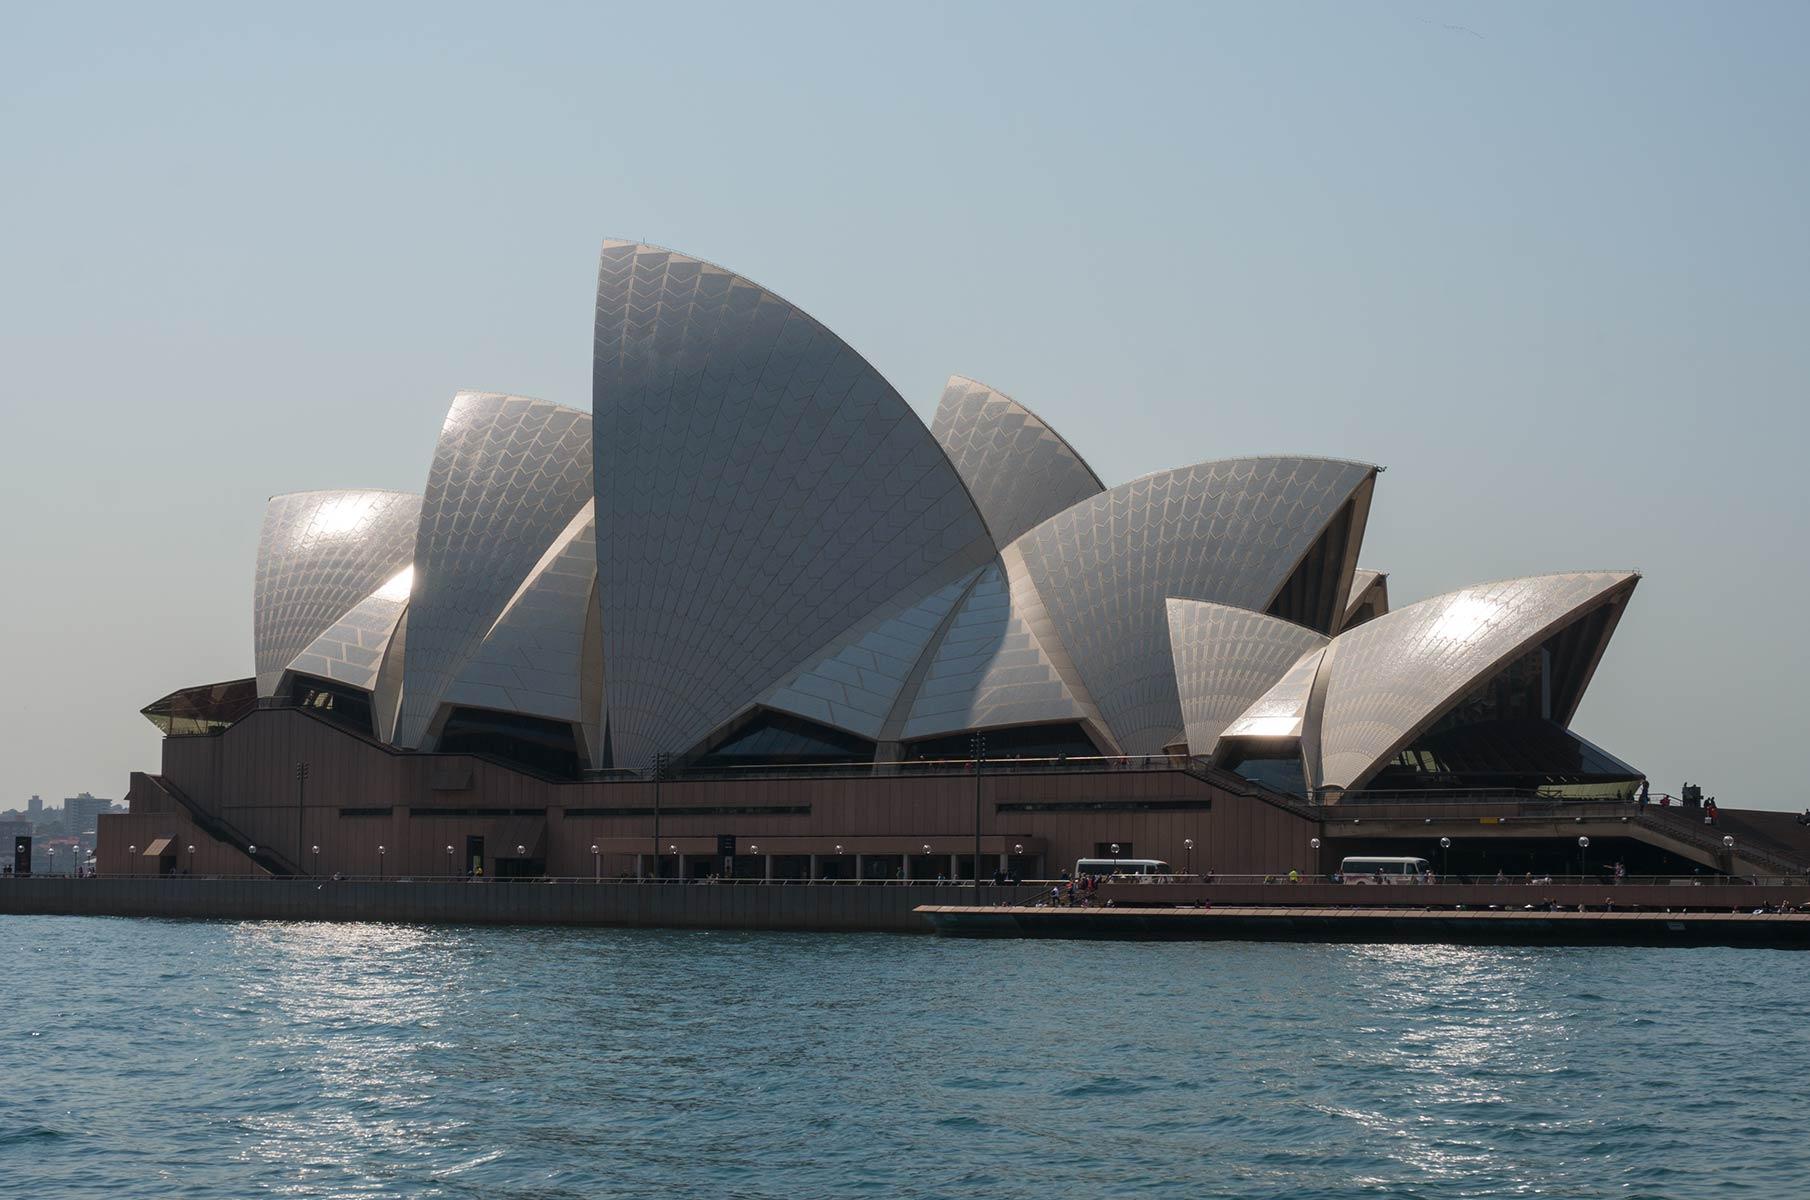 Sydney Opera House Opernhaus, Australien